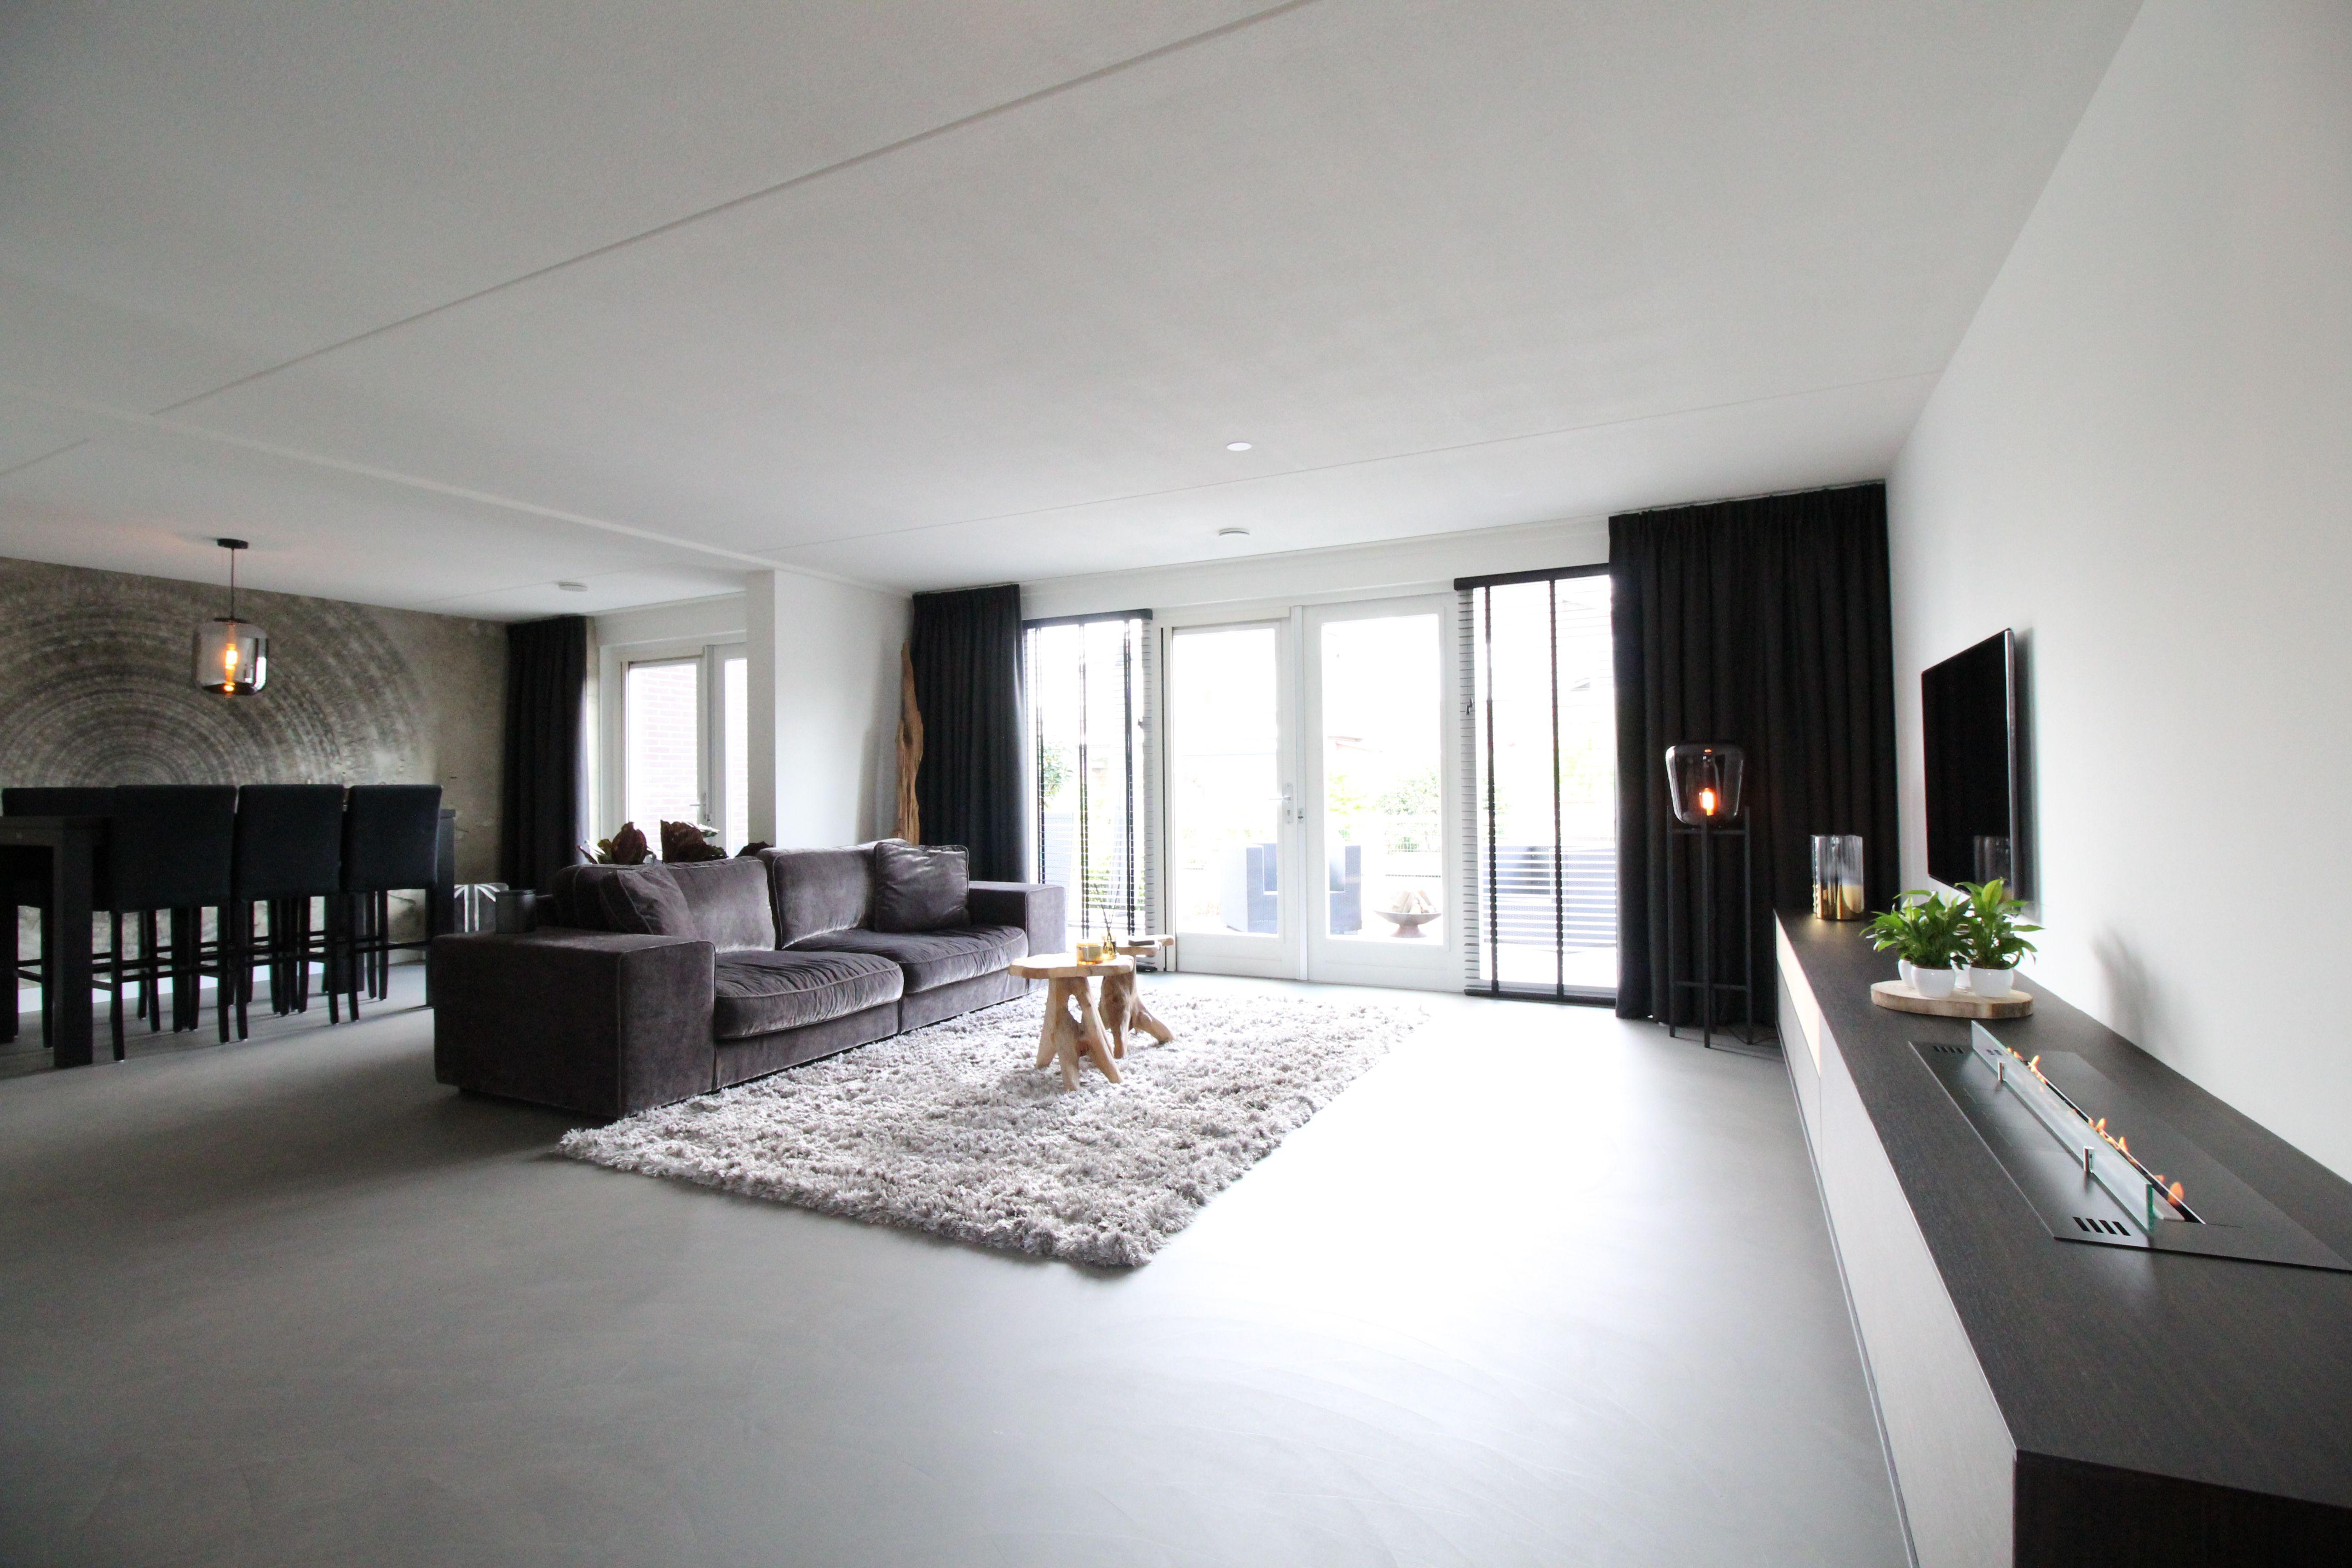 Exclusieve Gietvloer Woonkamer : Betonvloer met robuuste uitstraling in woonruimte motion